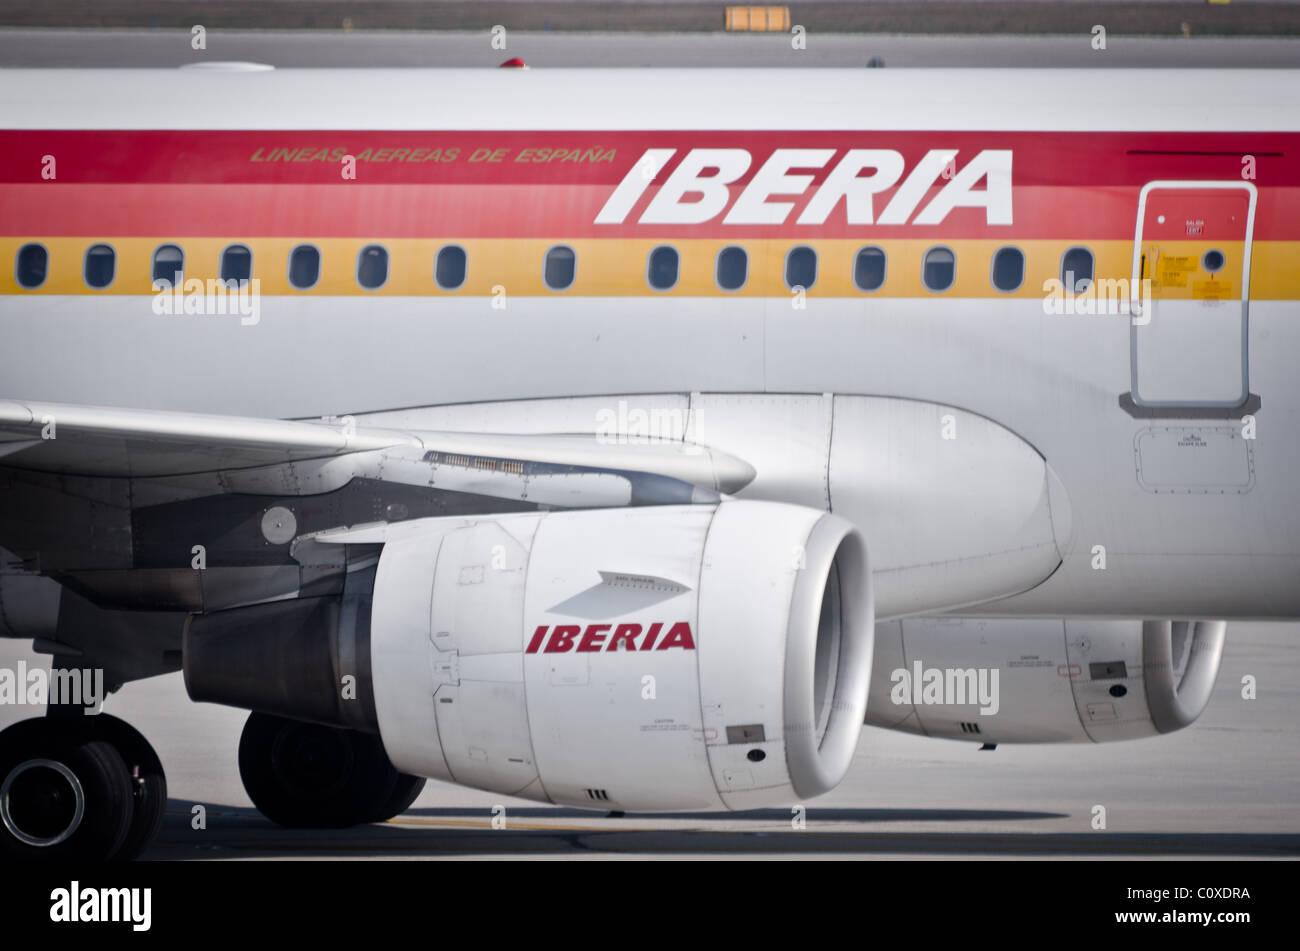 Iberia insignia passenger jet plane - Stock Image